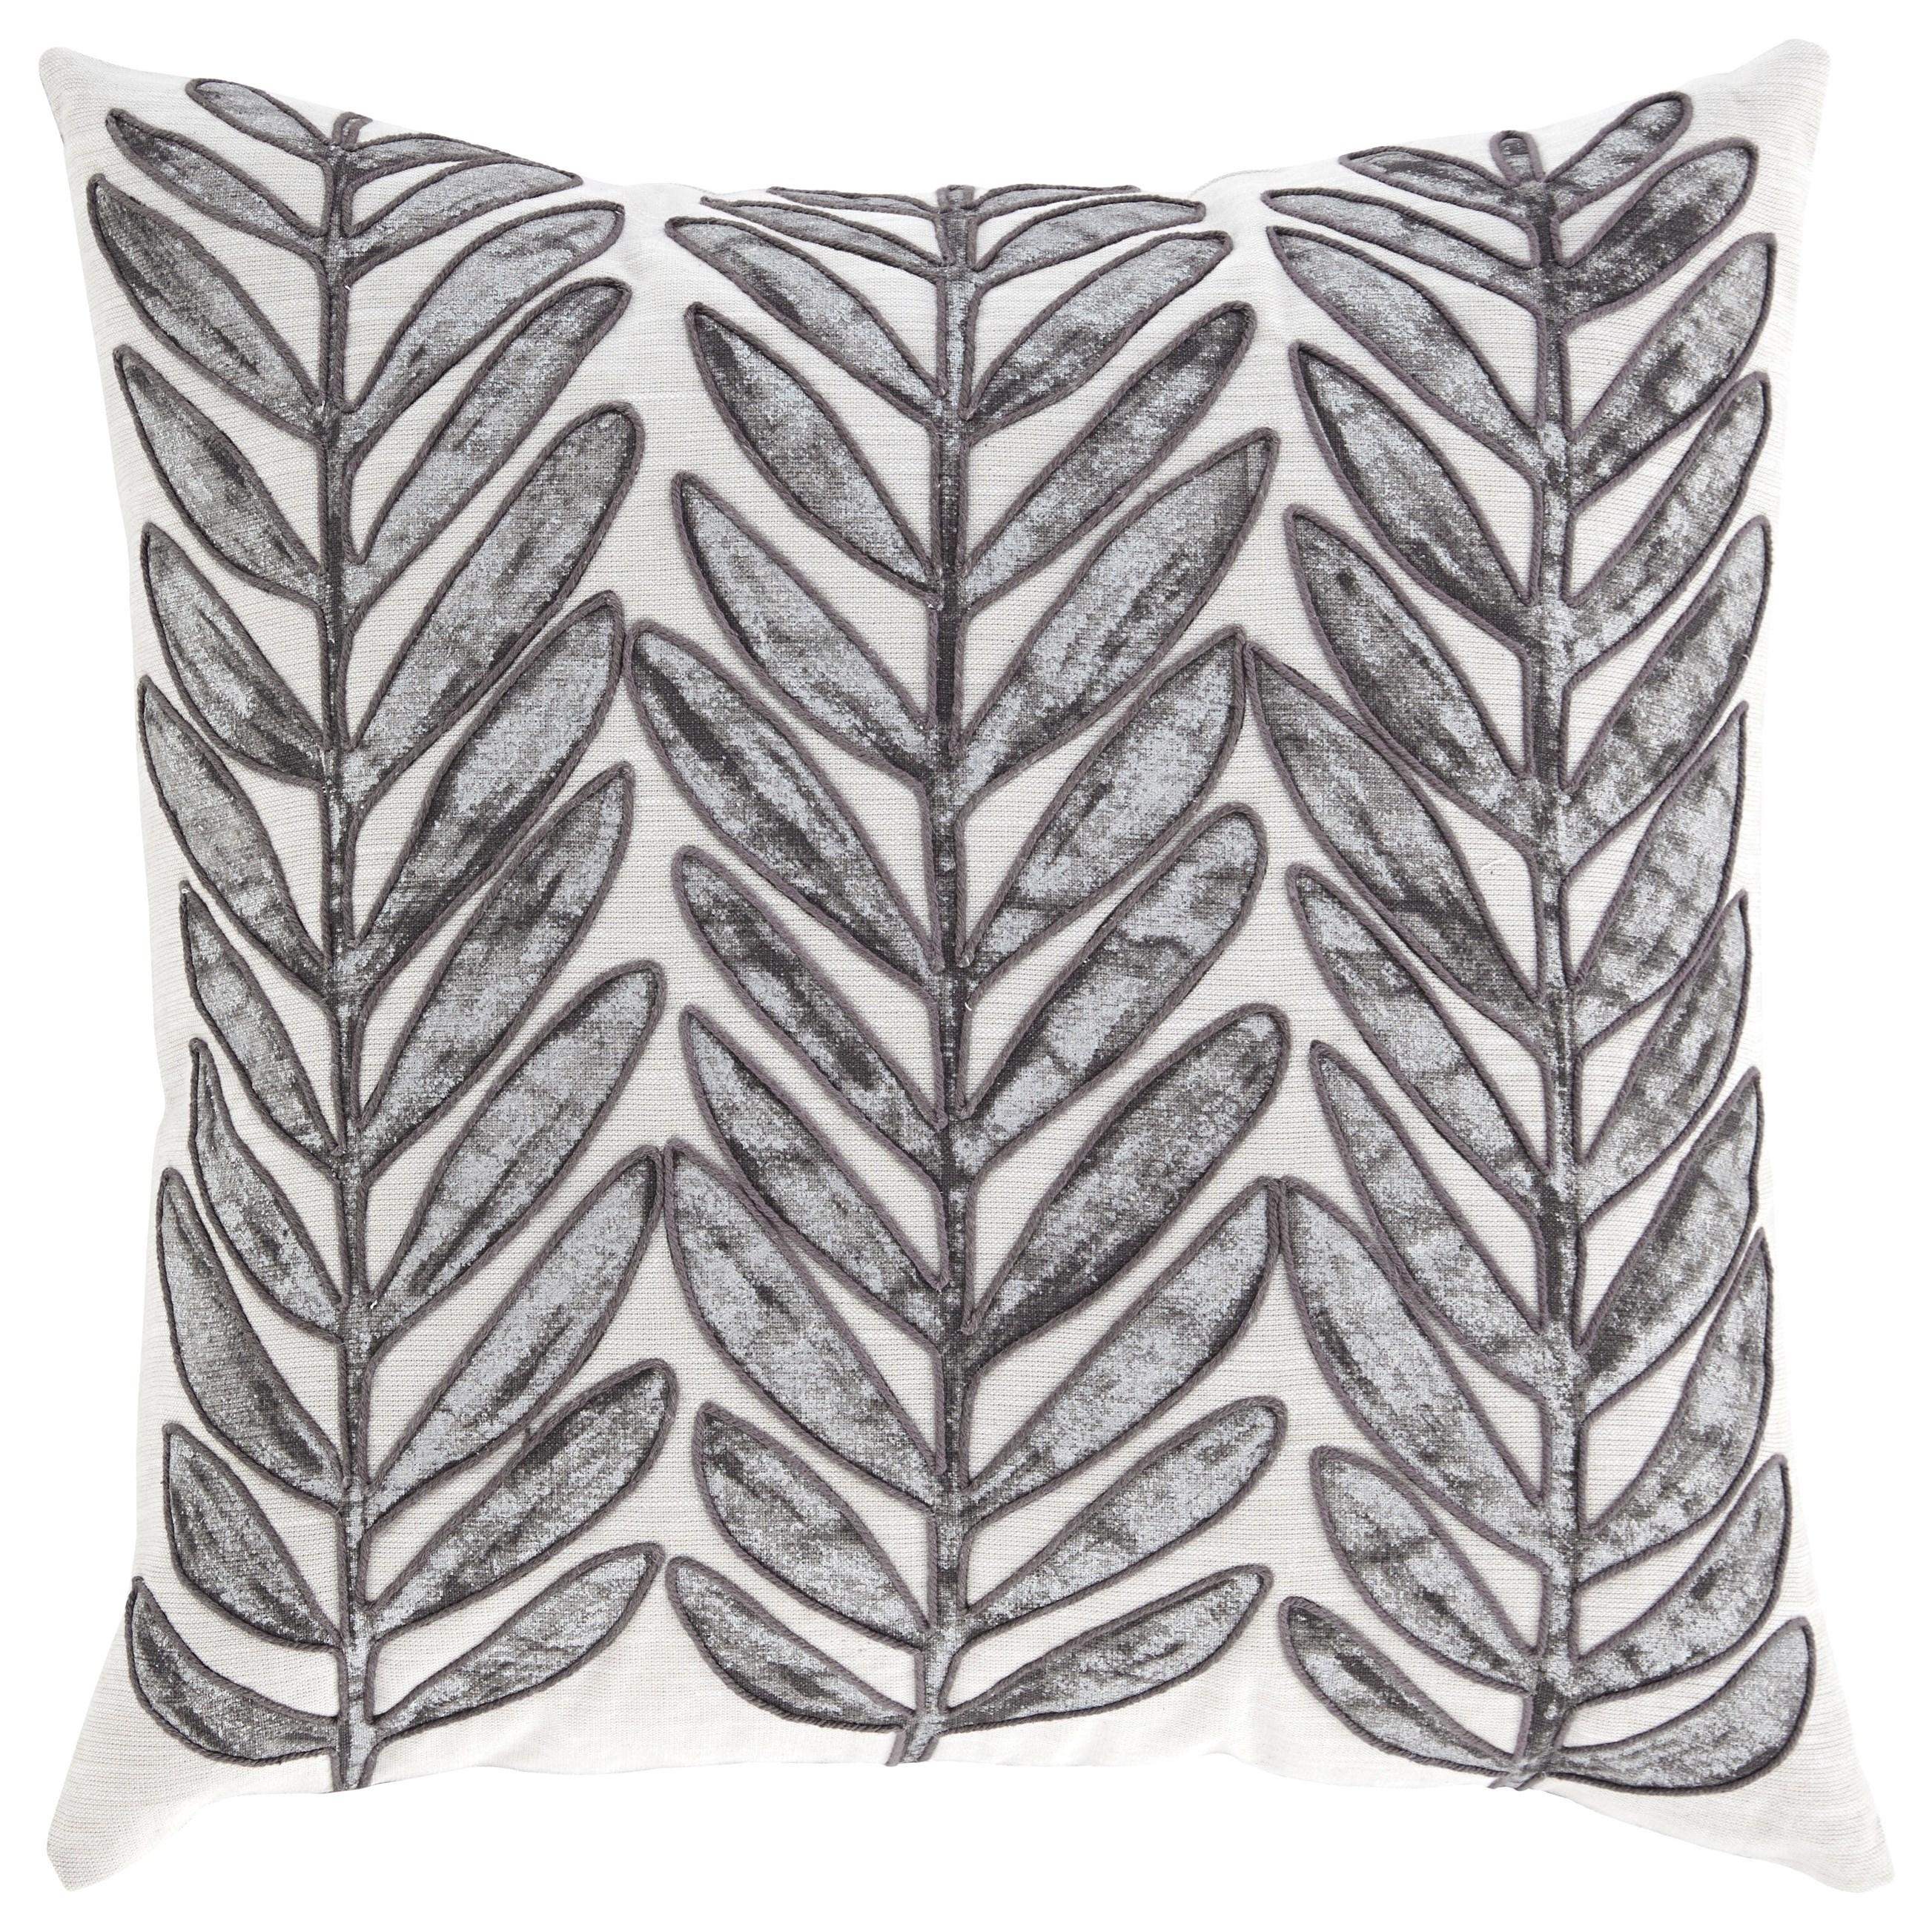 Pillows Masood Natural/Taupe Pillow by Benchcraft at Virginia Furniture Market